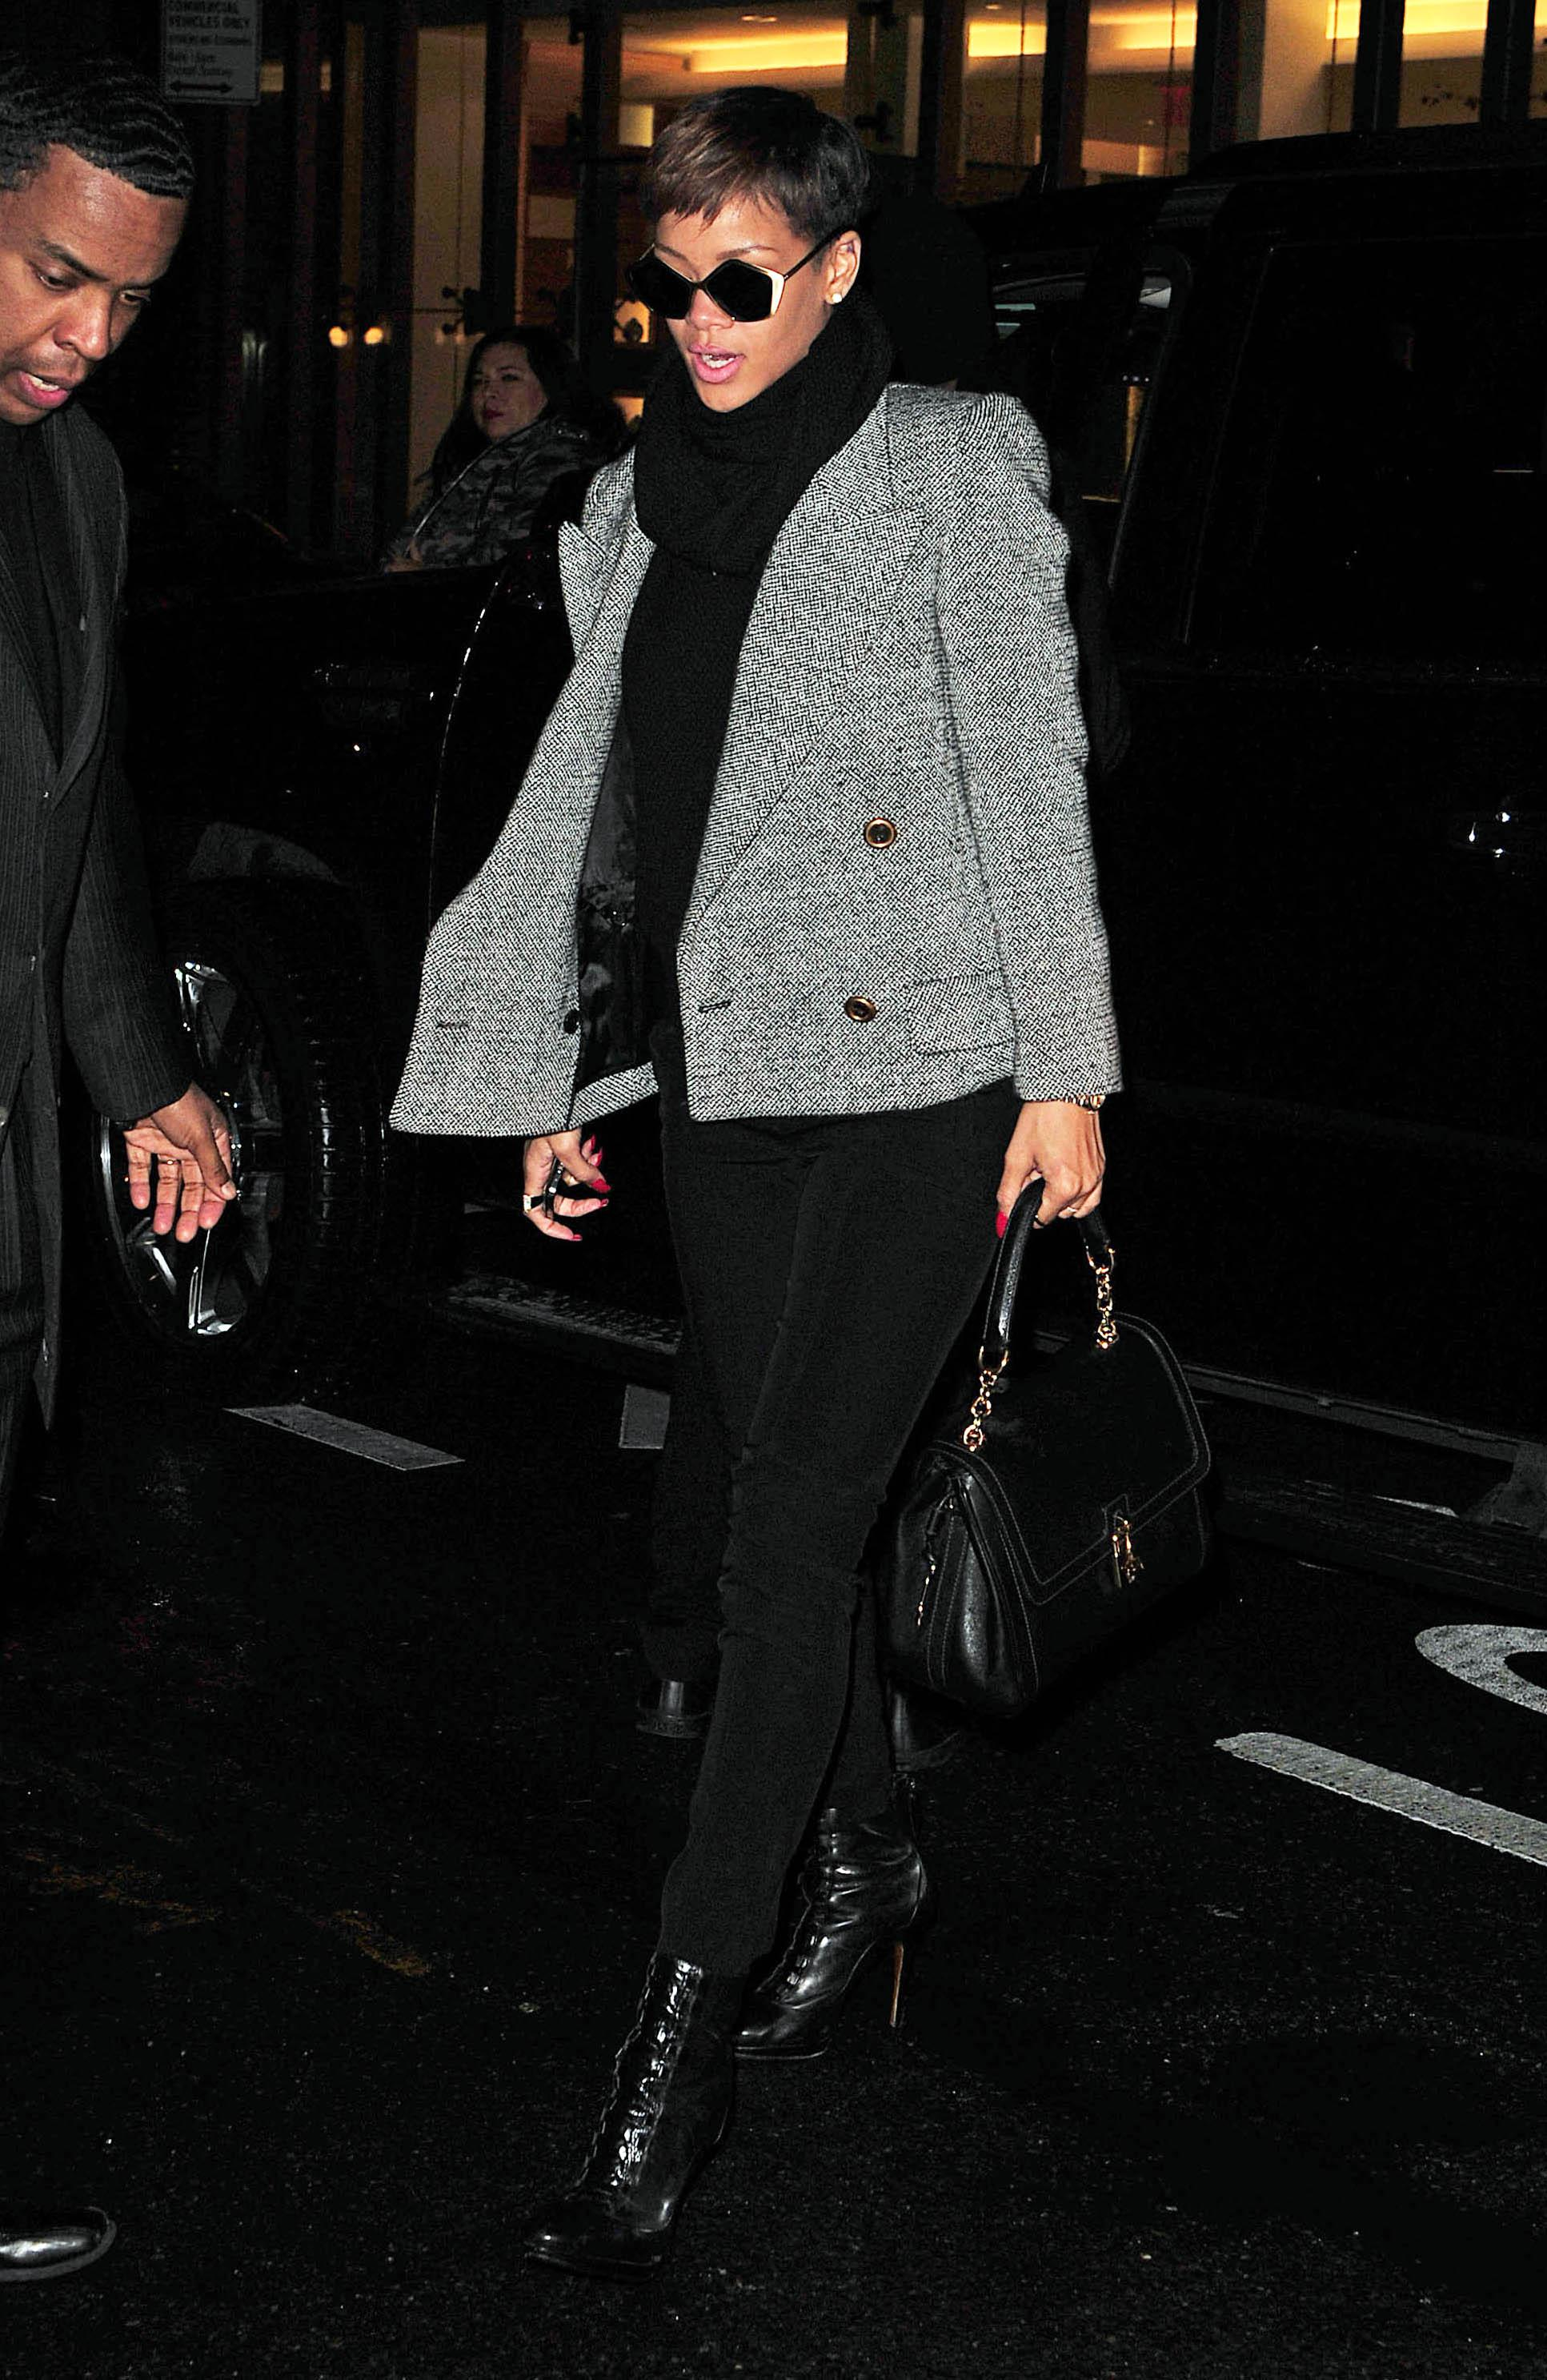 Celebrity Sightings In New York - January 29, 2013